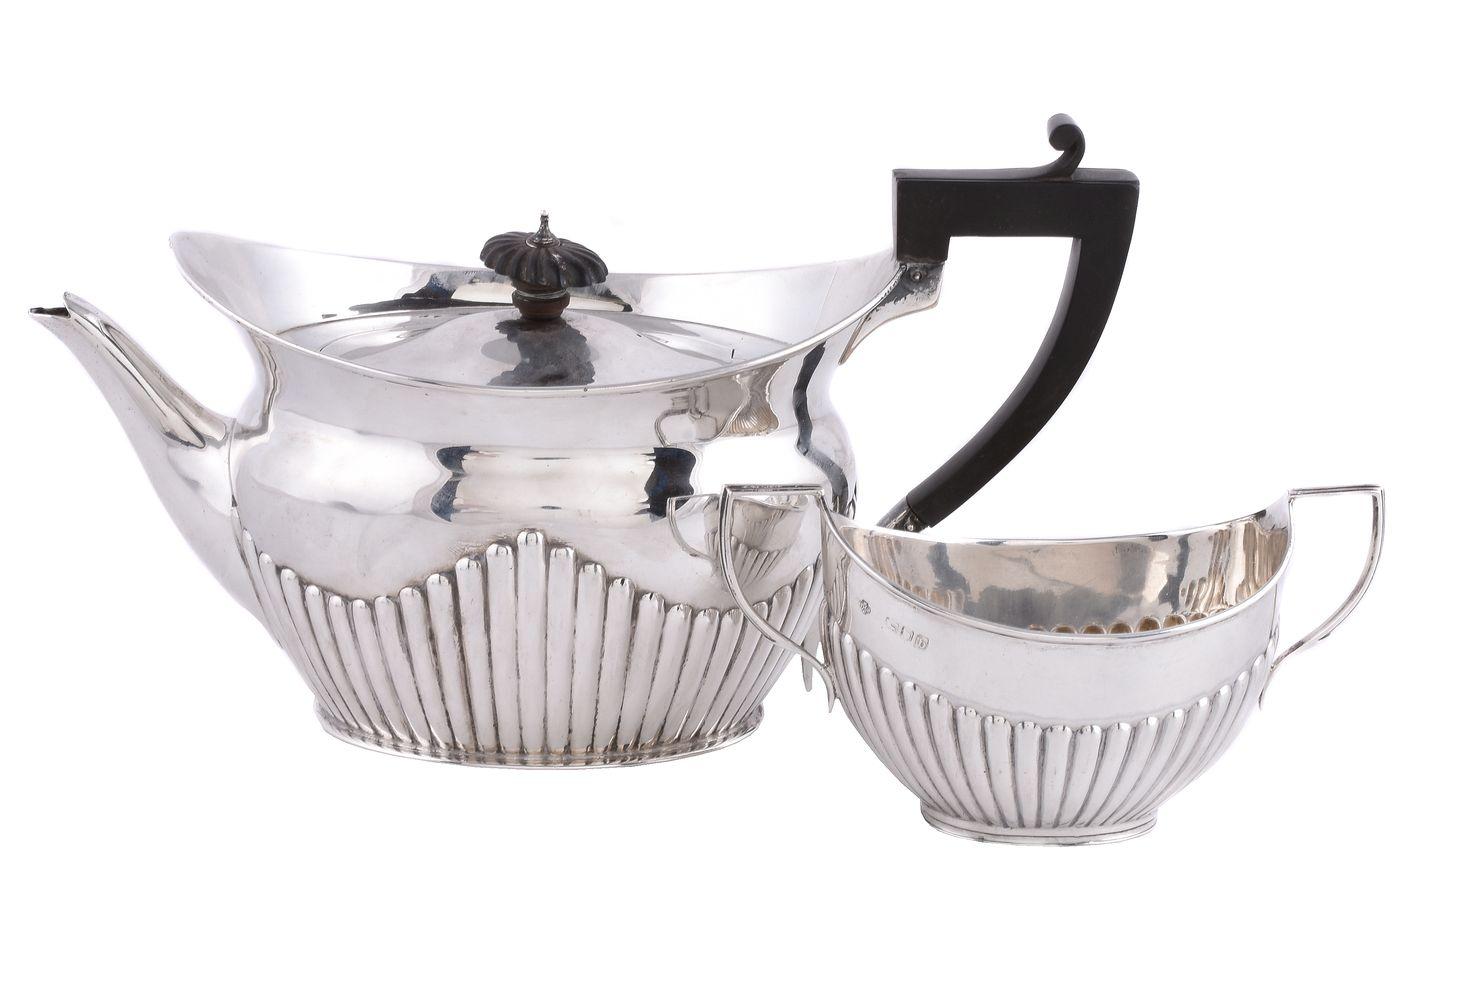 A late Victorian silver navette shape tea pot by The Goldsmiths & Silversmiths Co. Ltd